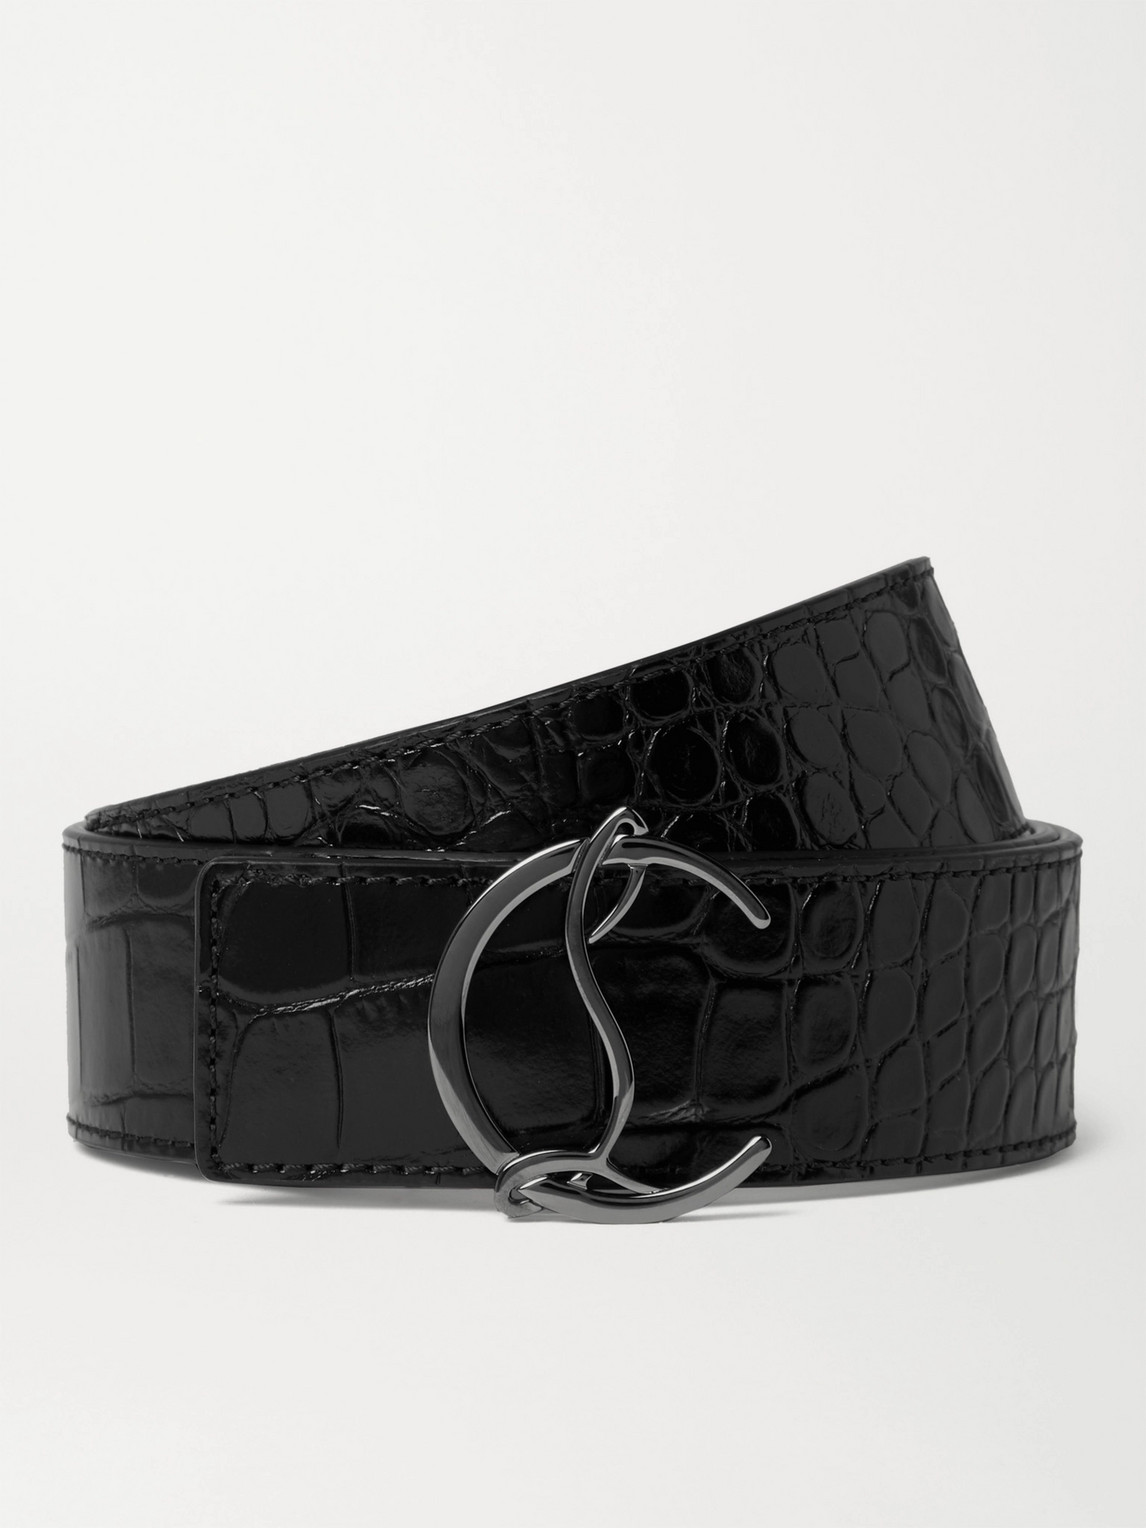 christian louboutin - 4cm croc-effect leather belt - men - black